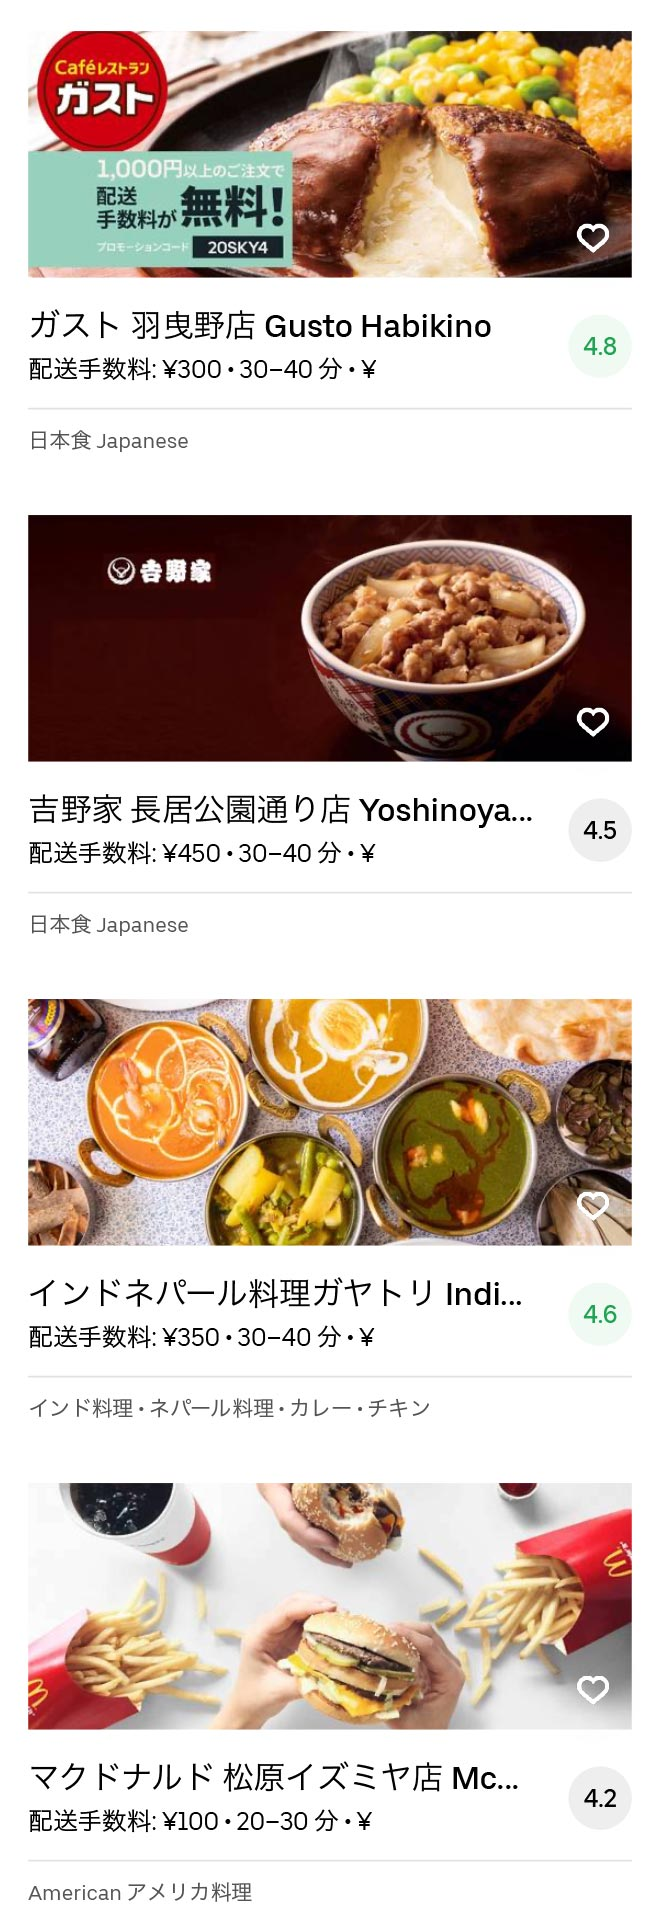 Kawachimatsubara menu 2005 03